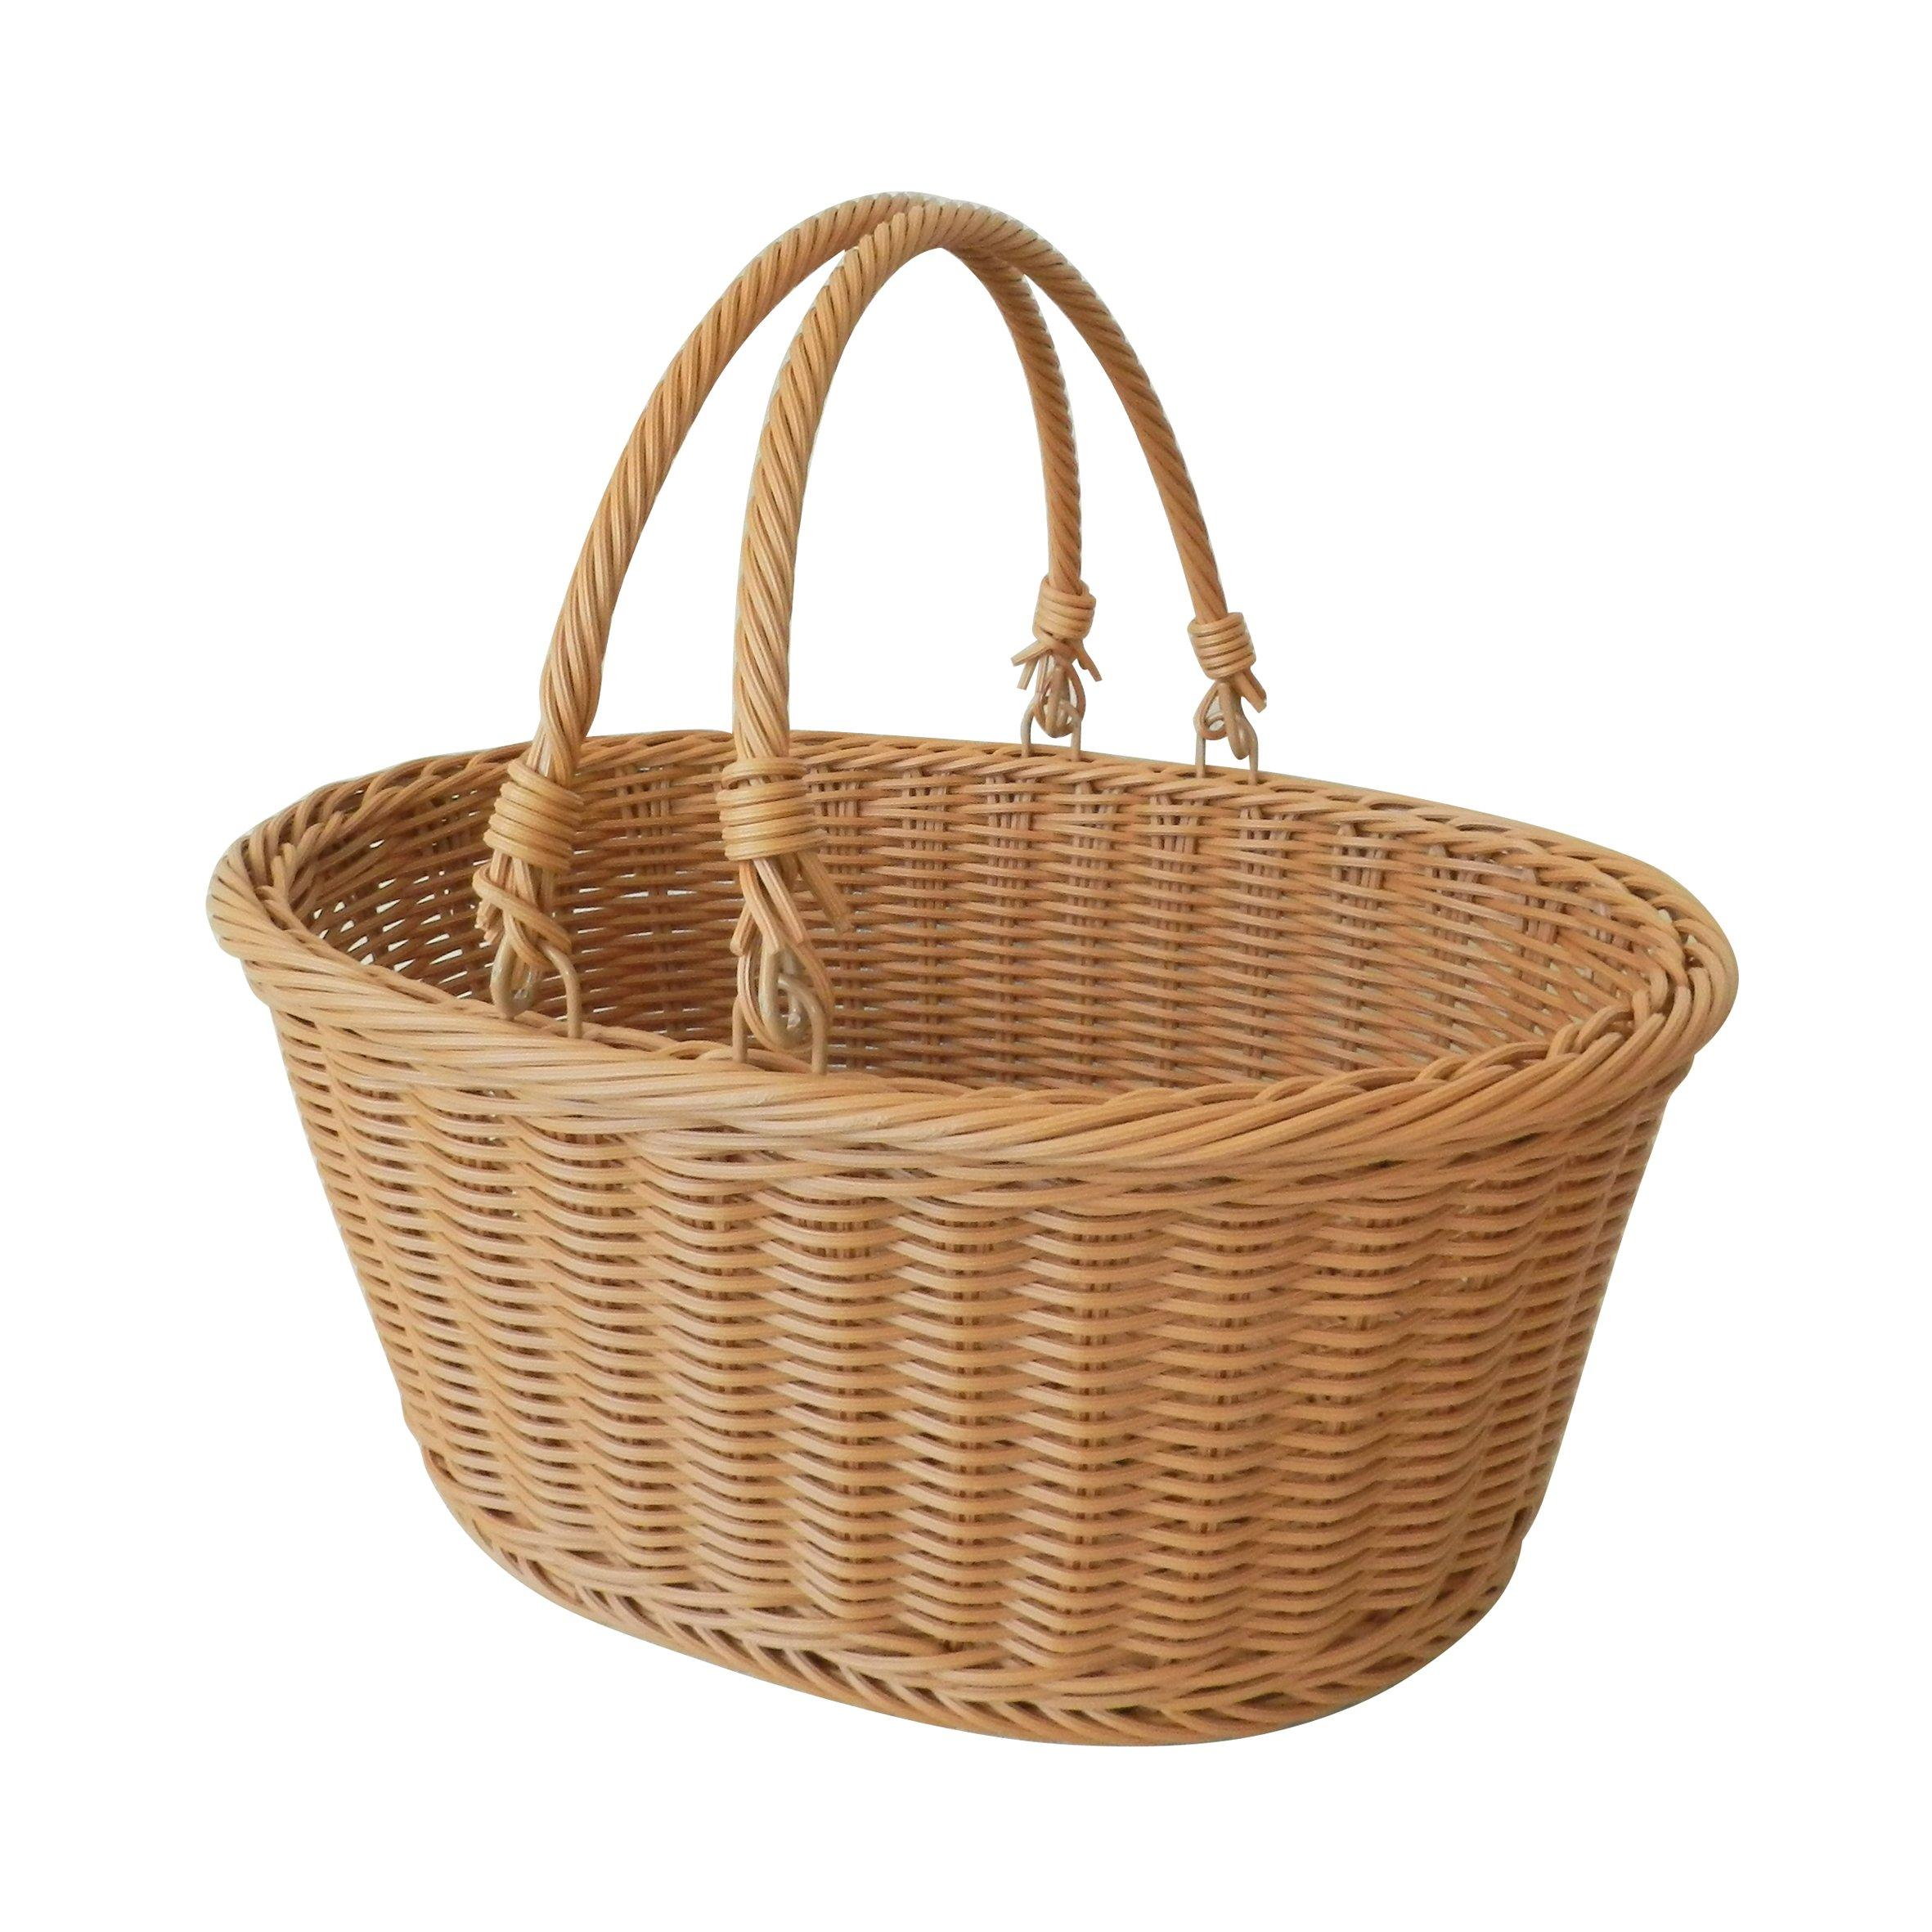 CVHOMEDECO. Oval Imitation Rattan Storage Basket Shopping Basket Market Basket with Swimming Handle Resin Wicker Picnic Basket.Light Brown. 14''X11''X6-1/2 H